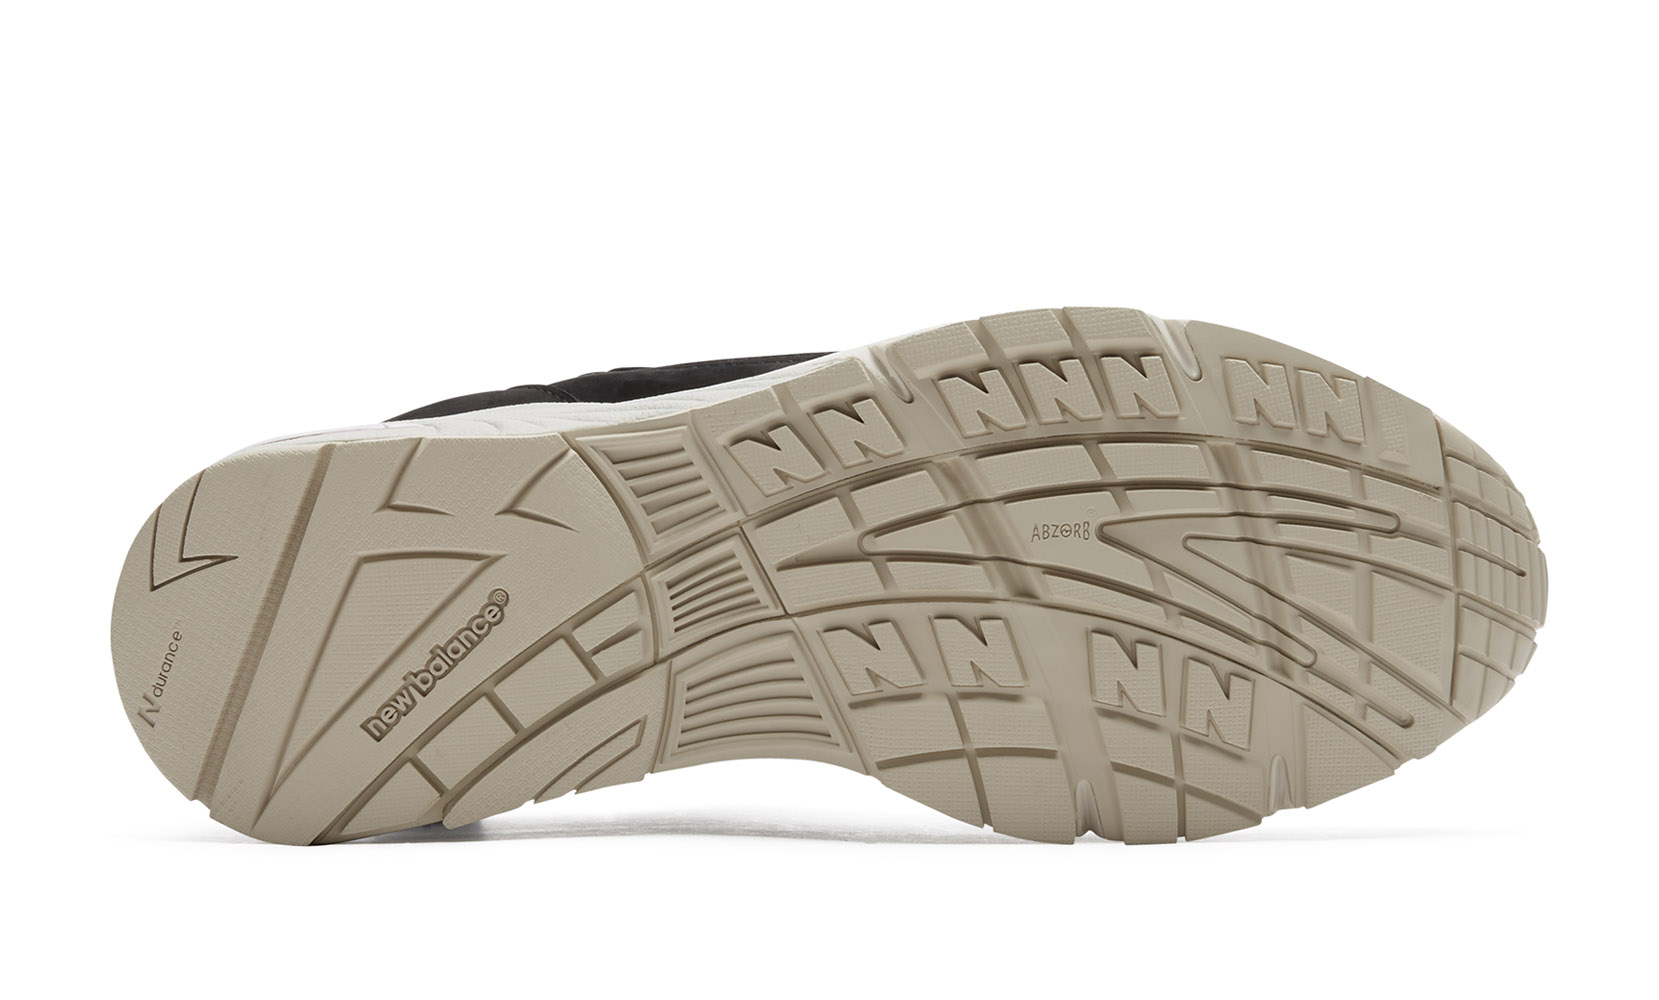 Чоловіче взуття повсякденне New Balance 991 Made in UK M991NKR | New Balance